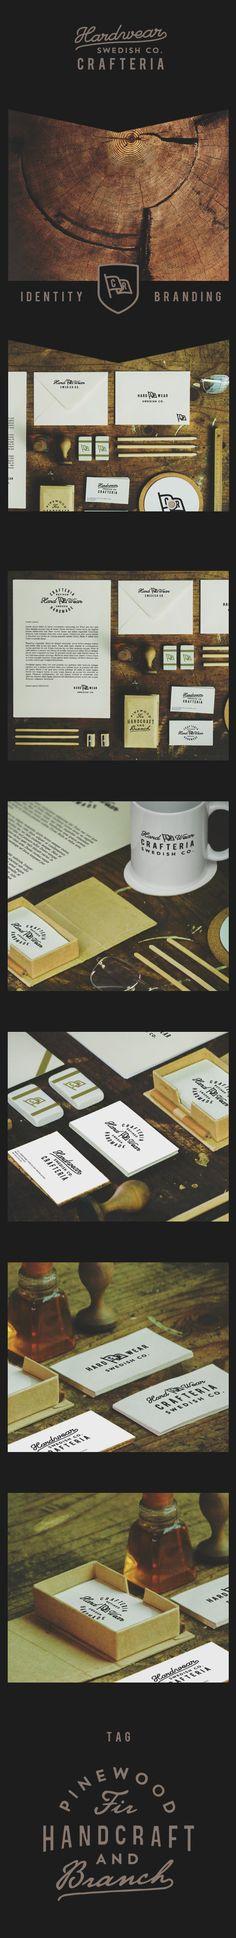 Hardwear Swedish Co. Crafteria branding | Authentic China Identity by Yohanes Raymond, via Behance | #stationary #corporate #design #corporatedesign #identity #branding #marketing < repinned by www.BlickeDeeler.de | Visit our website: www.blickedeeler.de/leistungen/corporate-design